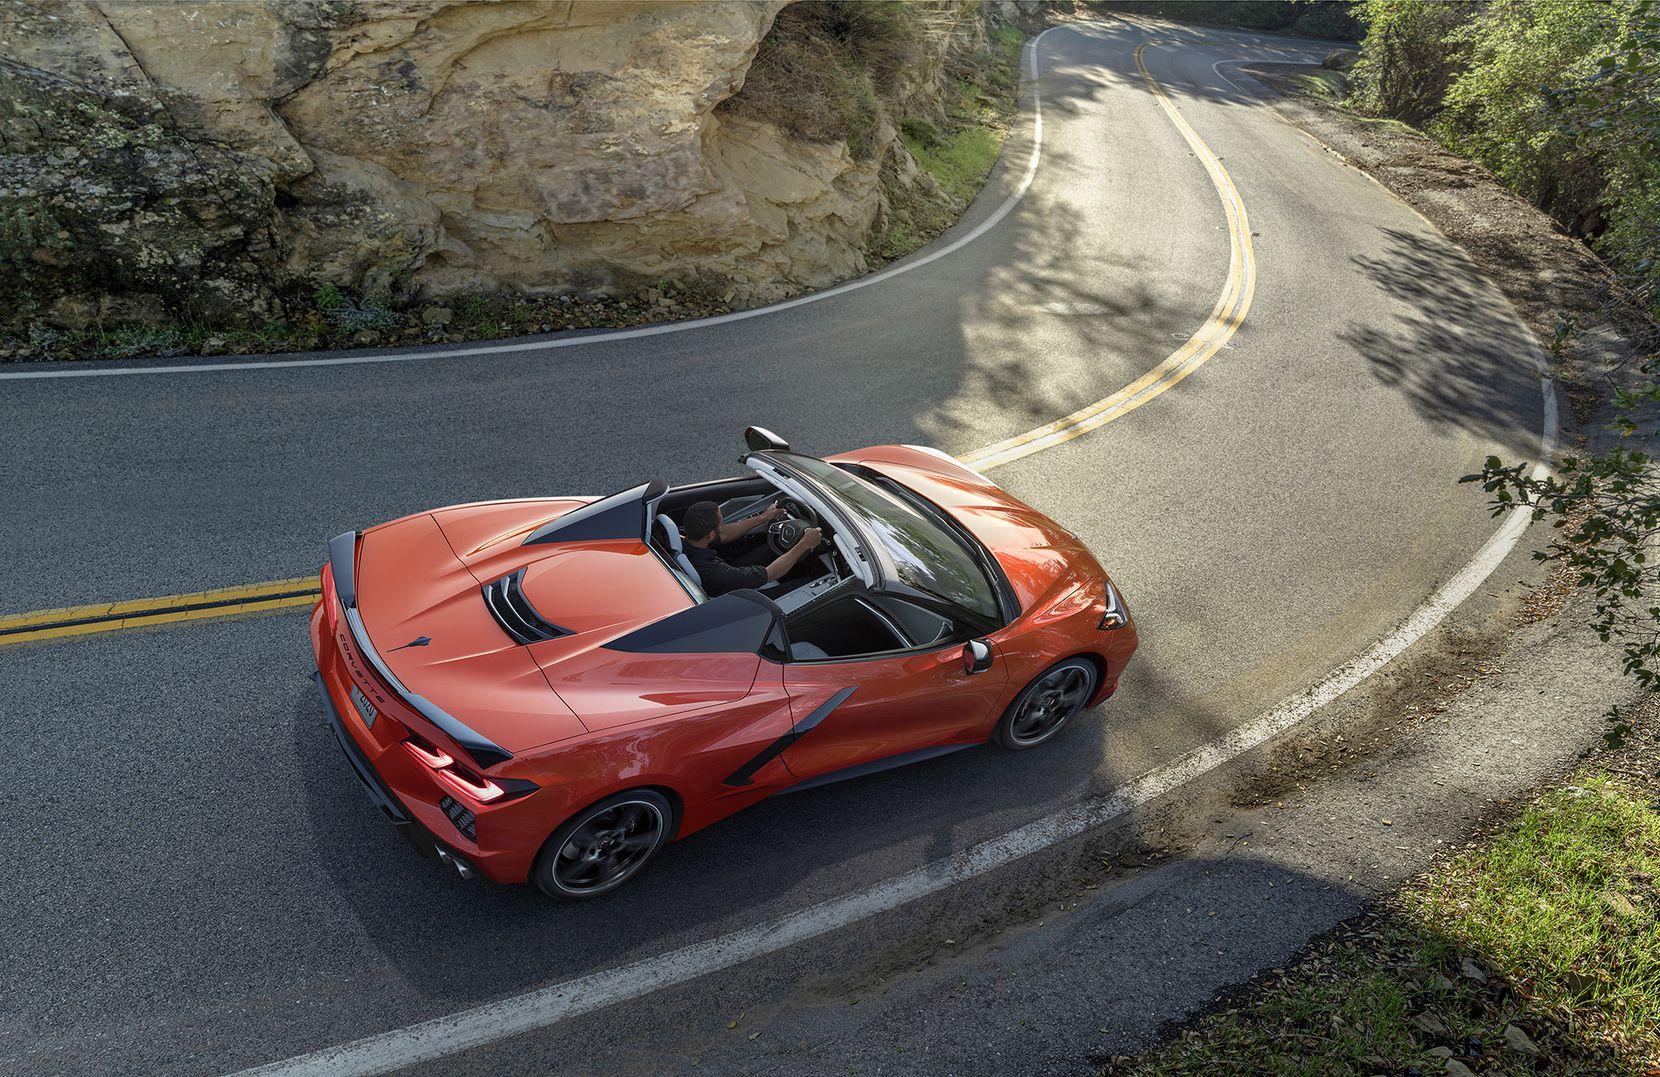 The 2020 Chevrolet Corvette Stingray convertible. (Chevrolet/TNS)